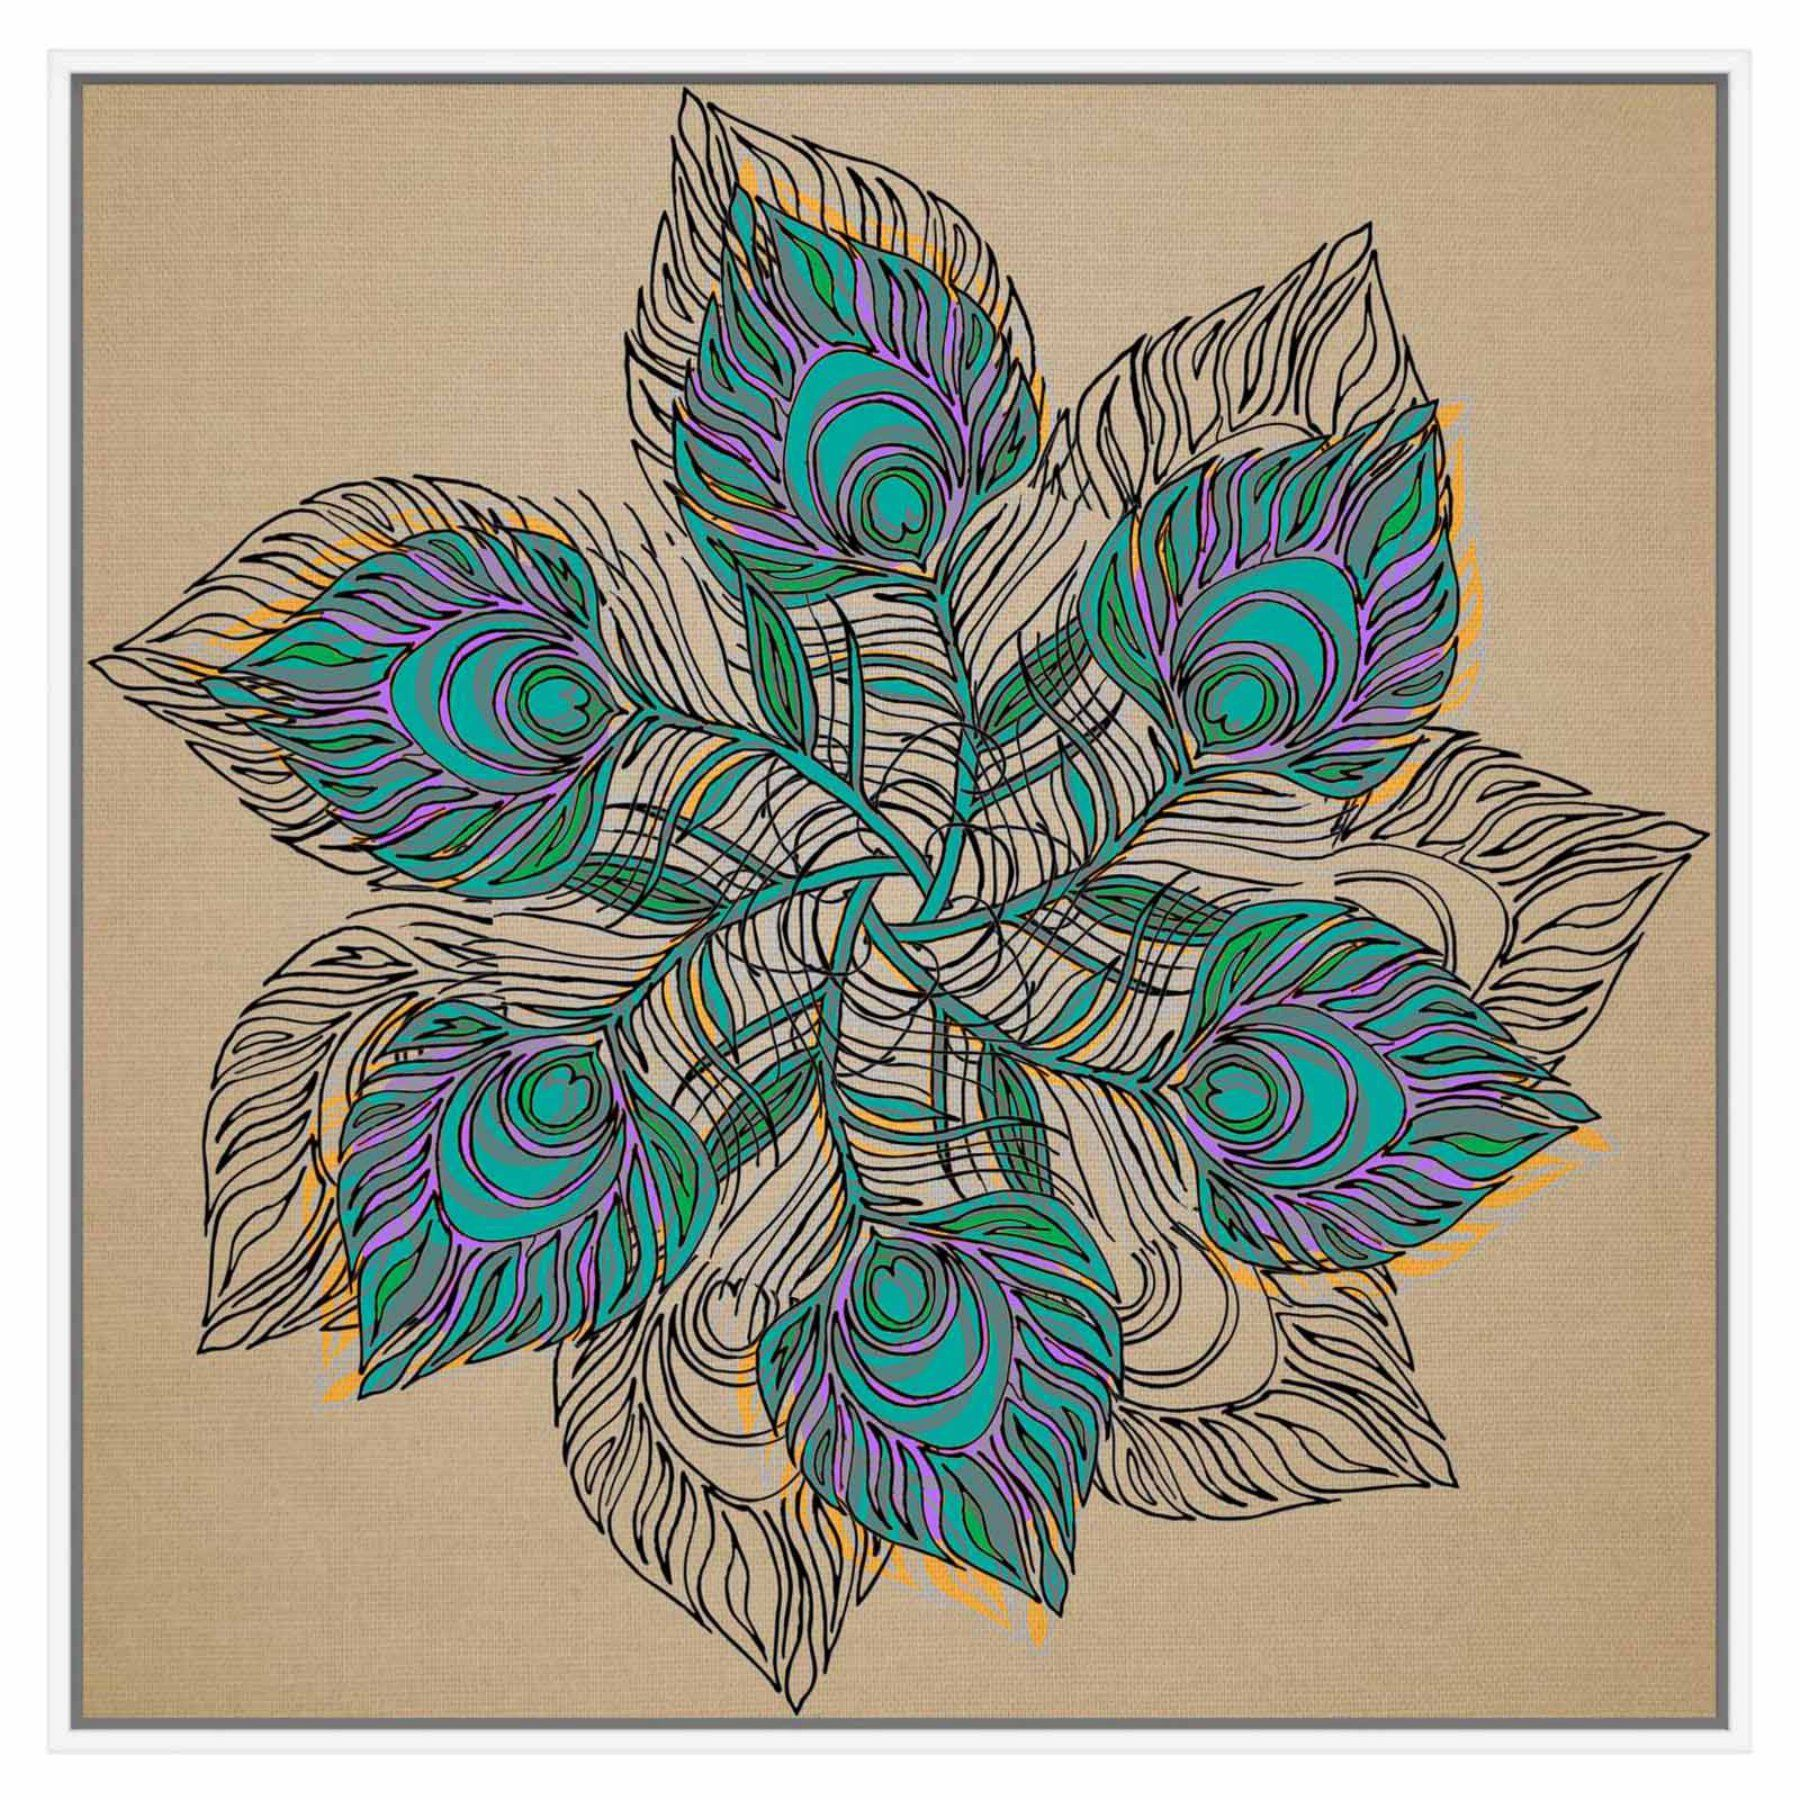 Ptm Images Boho Decorative Wall Art  9 92063